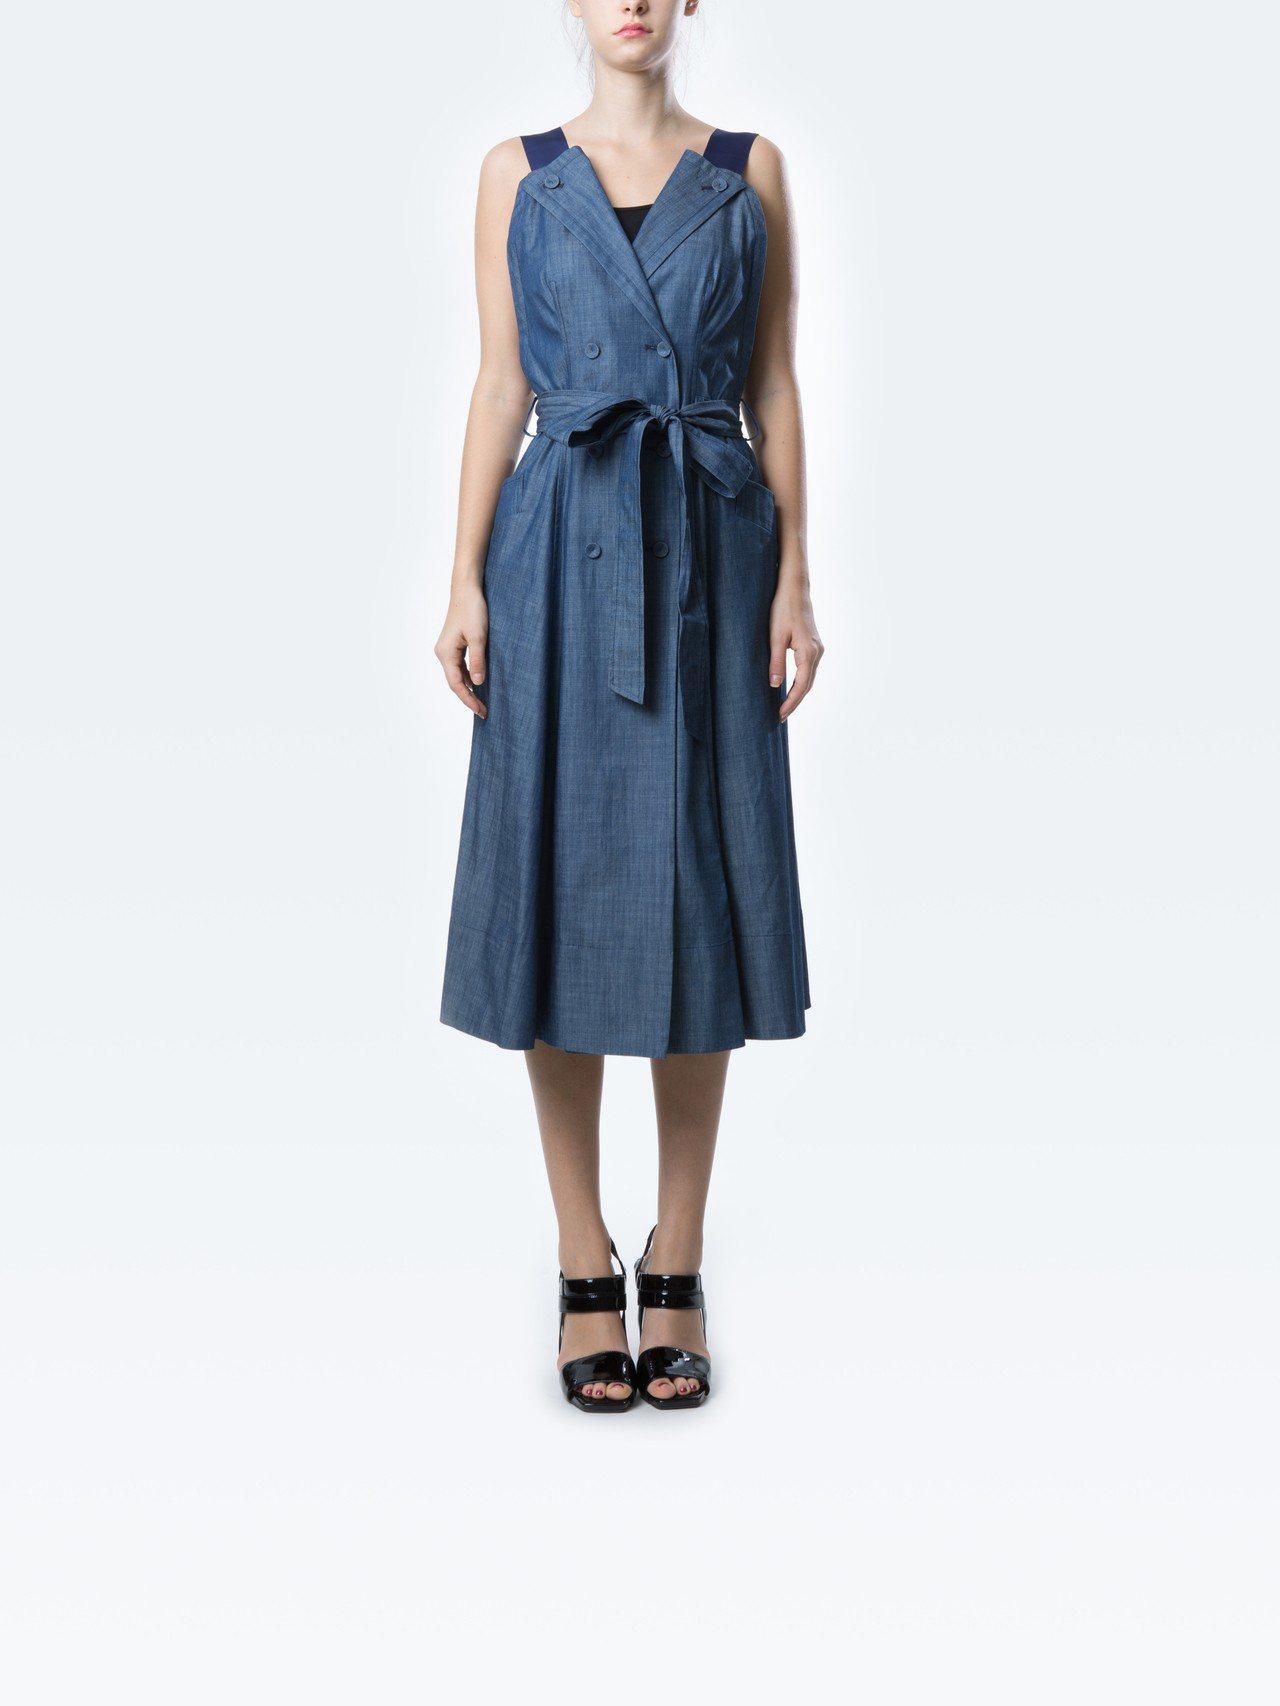 MARYLING雙排釦丹寧吊帶洋裝,價格店洽。圖/MARYLING提供